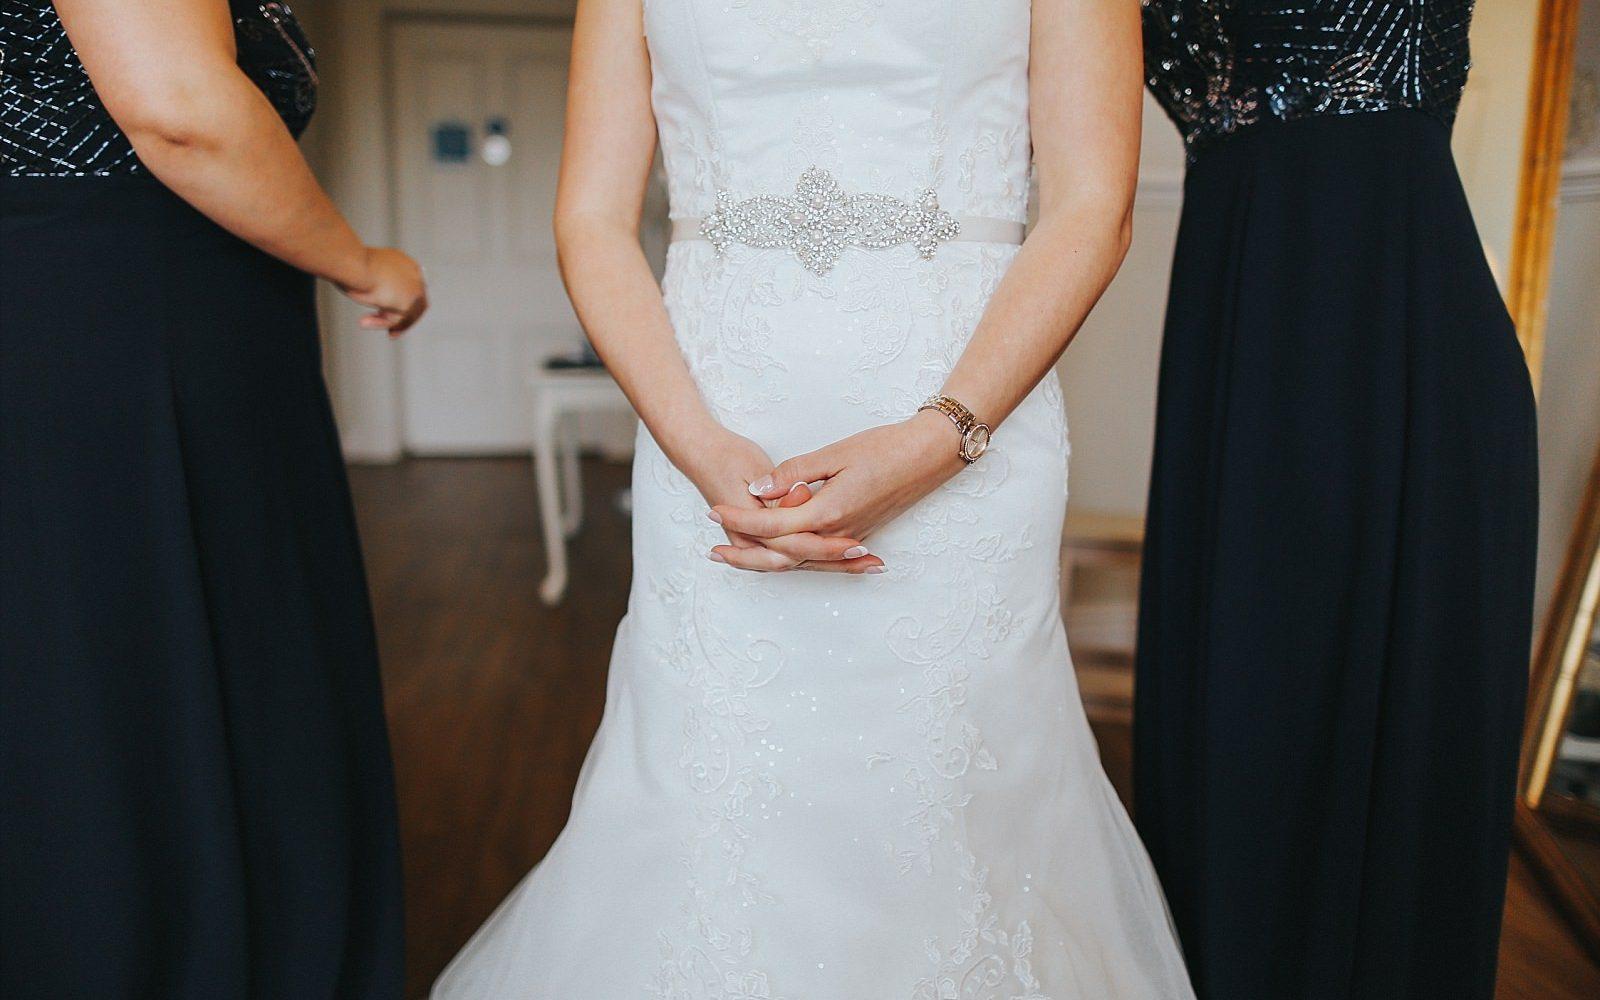 Ahfield-House-Wedding-Venue-Photography-Photographer-Wigan-embee-Photography-Matt-Burgess_0088